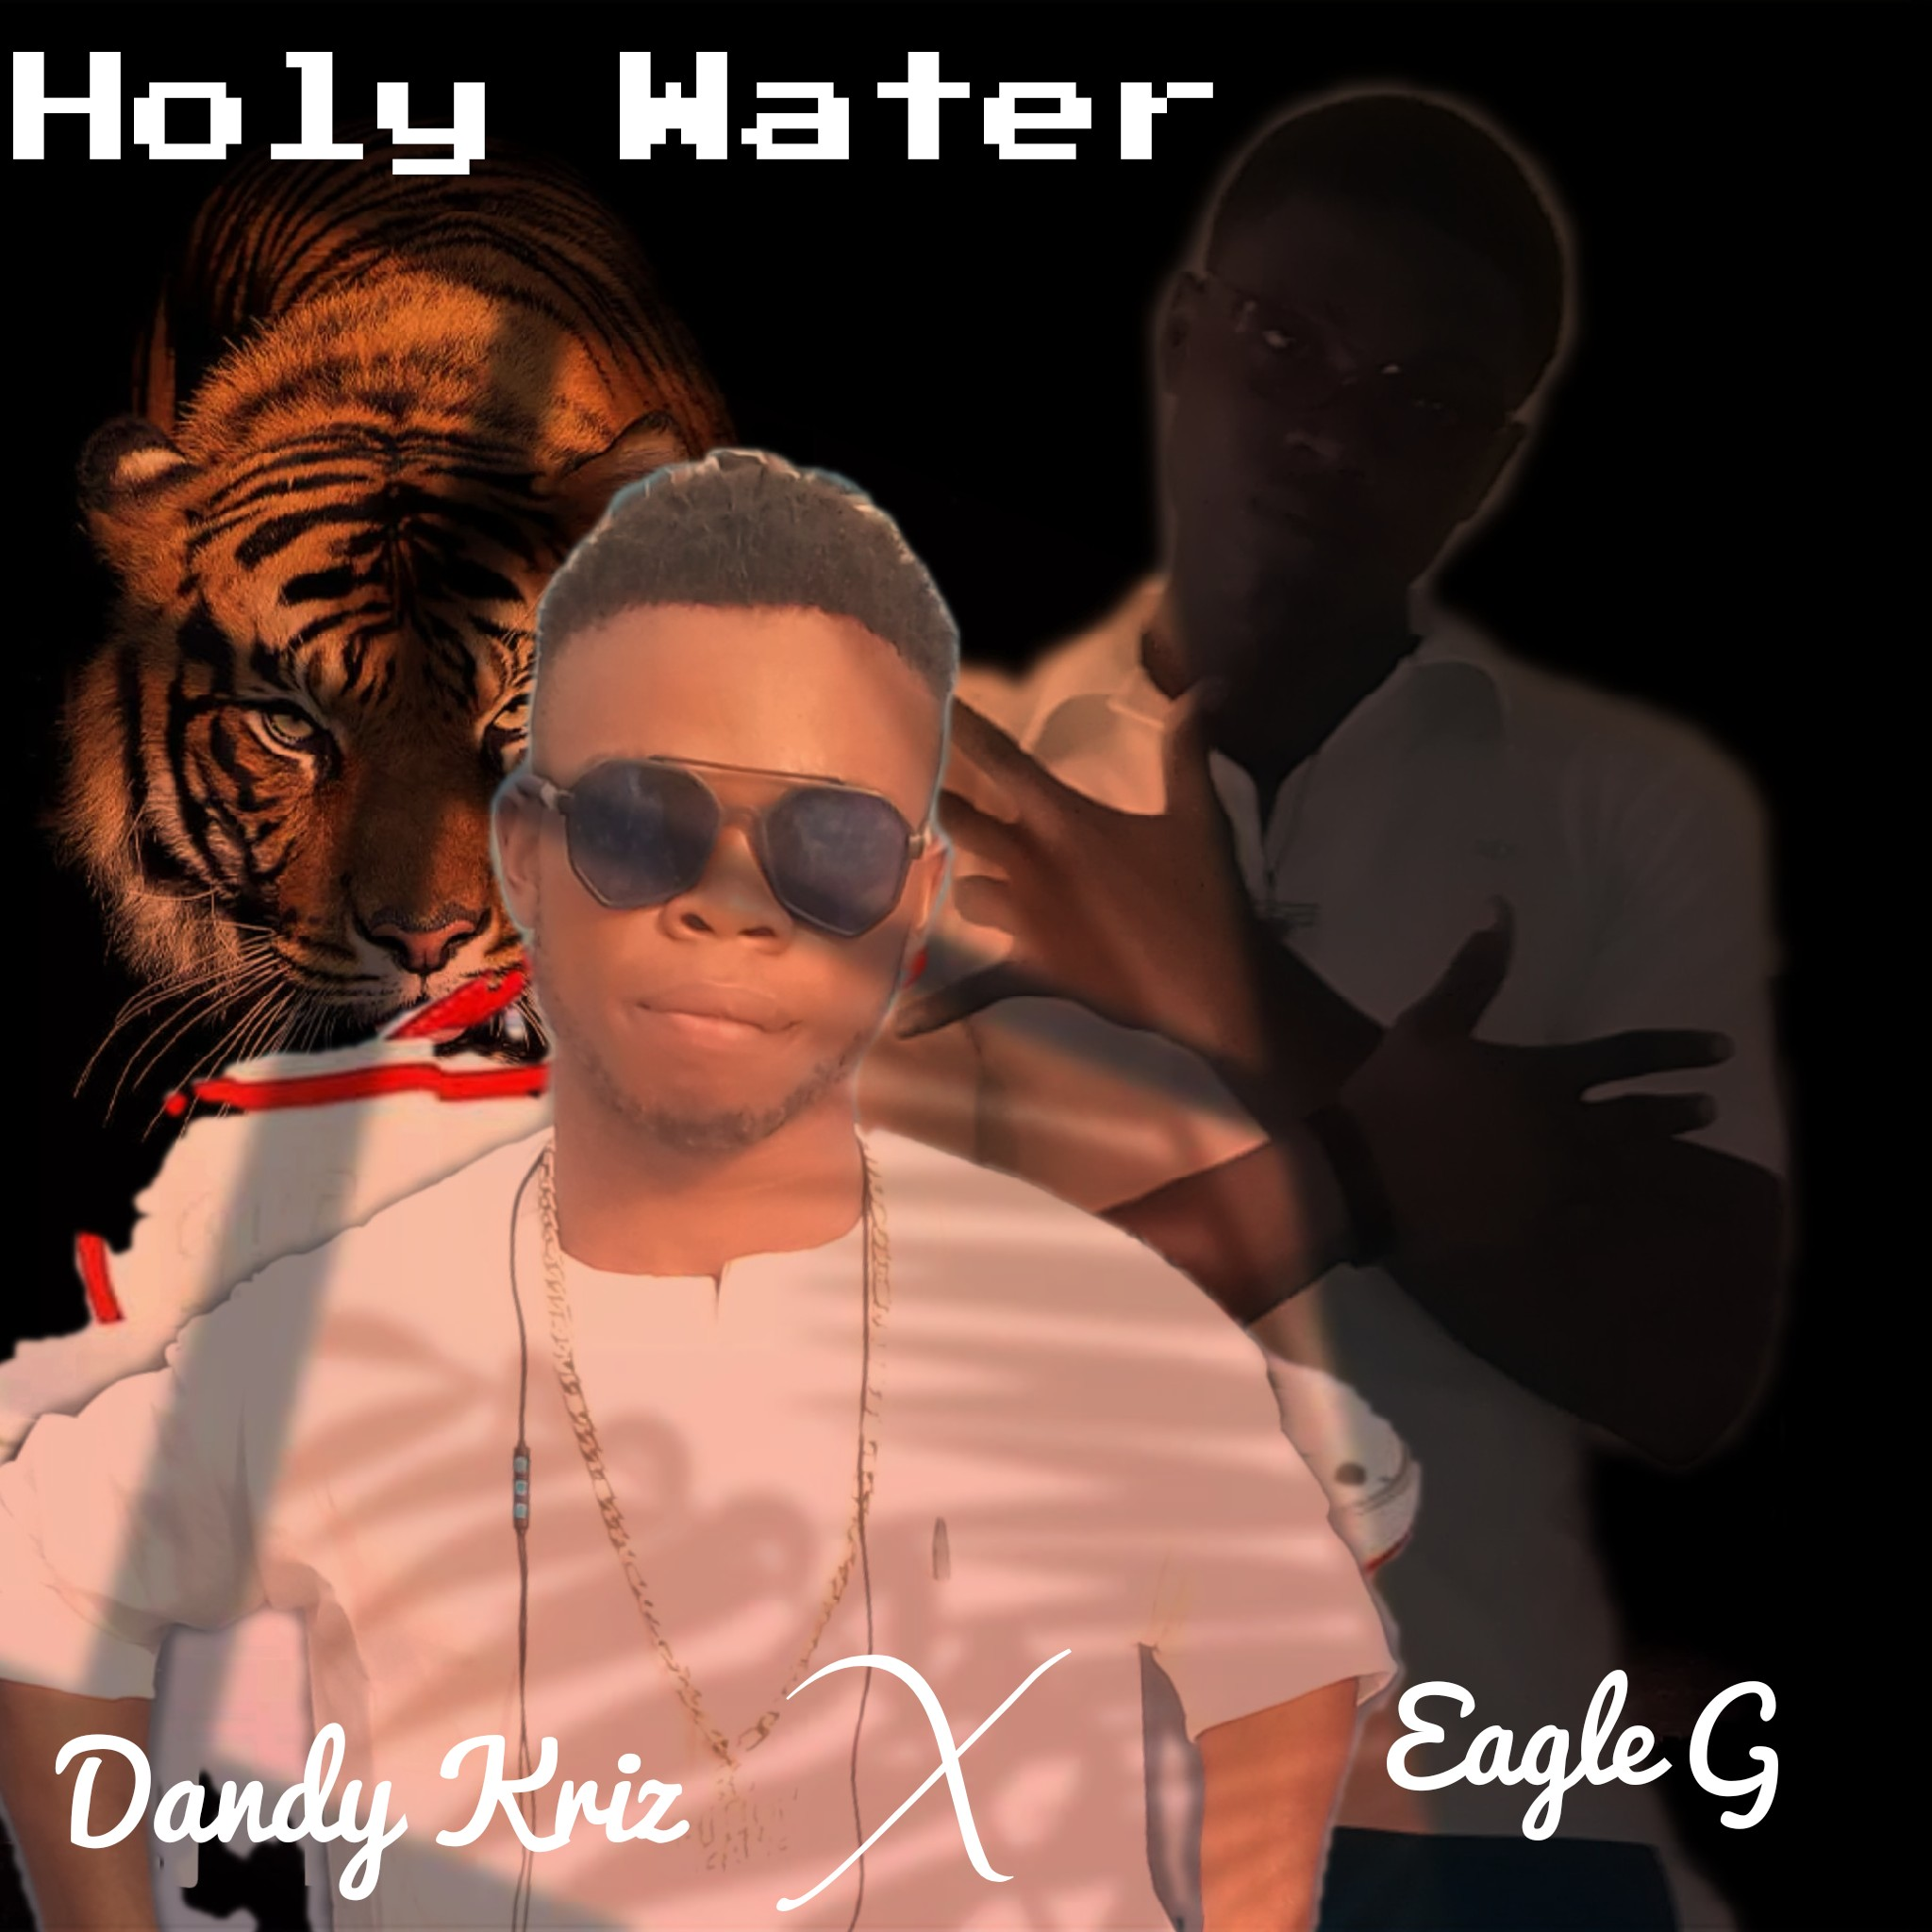 Dandy Kriz x Eagle G - Holy Water